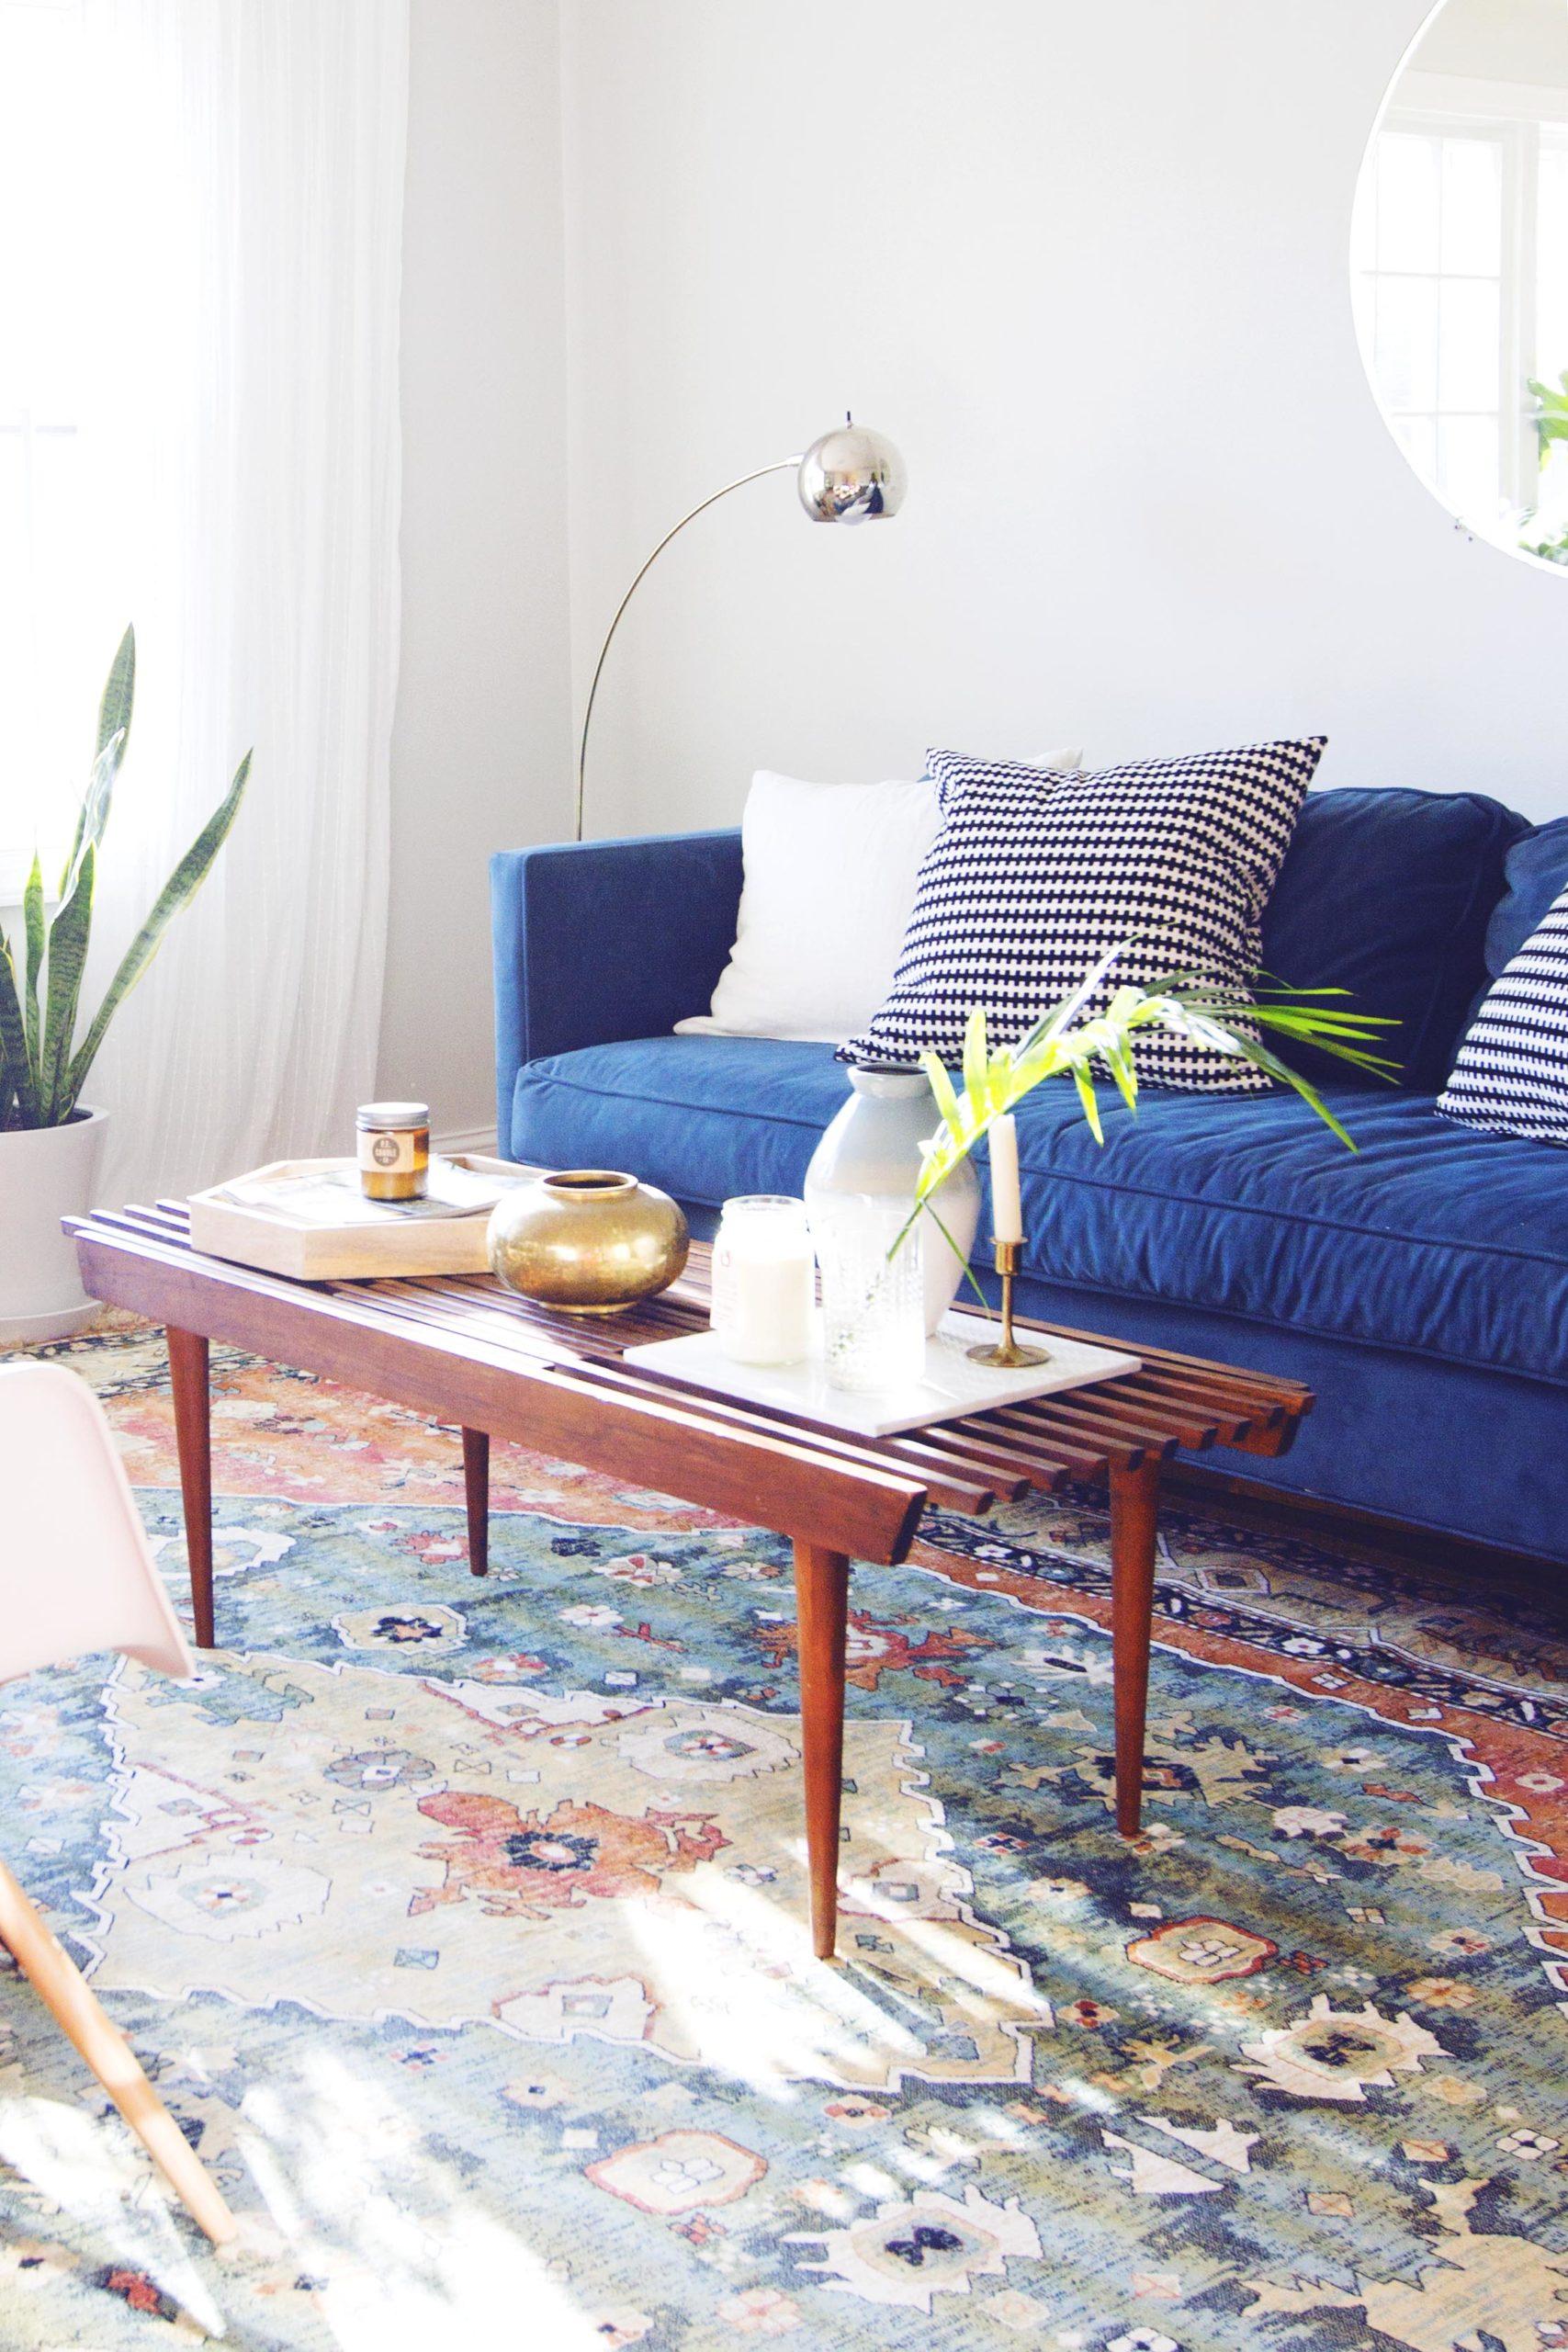 Design Updates In The Living Room Annabode Denver S 1 Sustainable Interior Design Firm